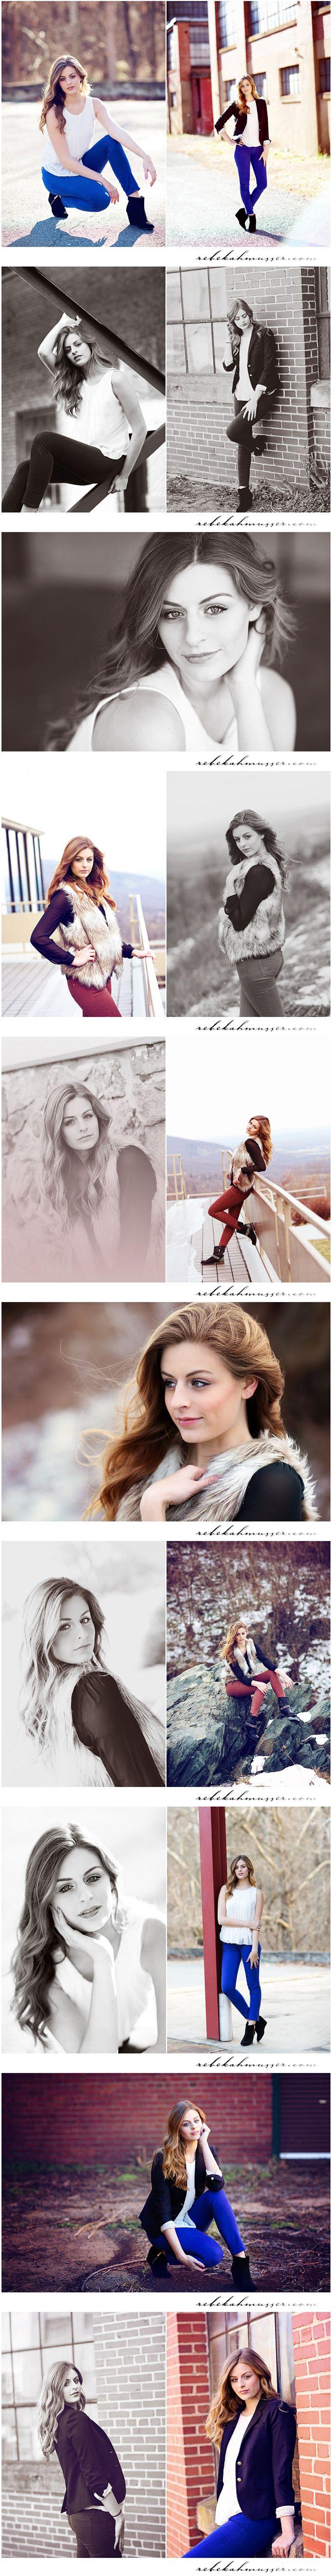 best beautiful womenphotography images on pinterest black